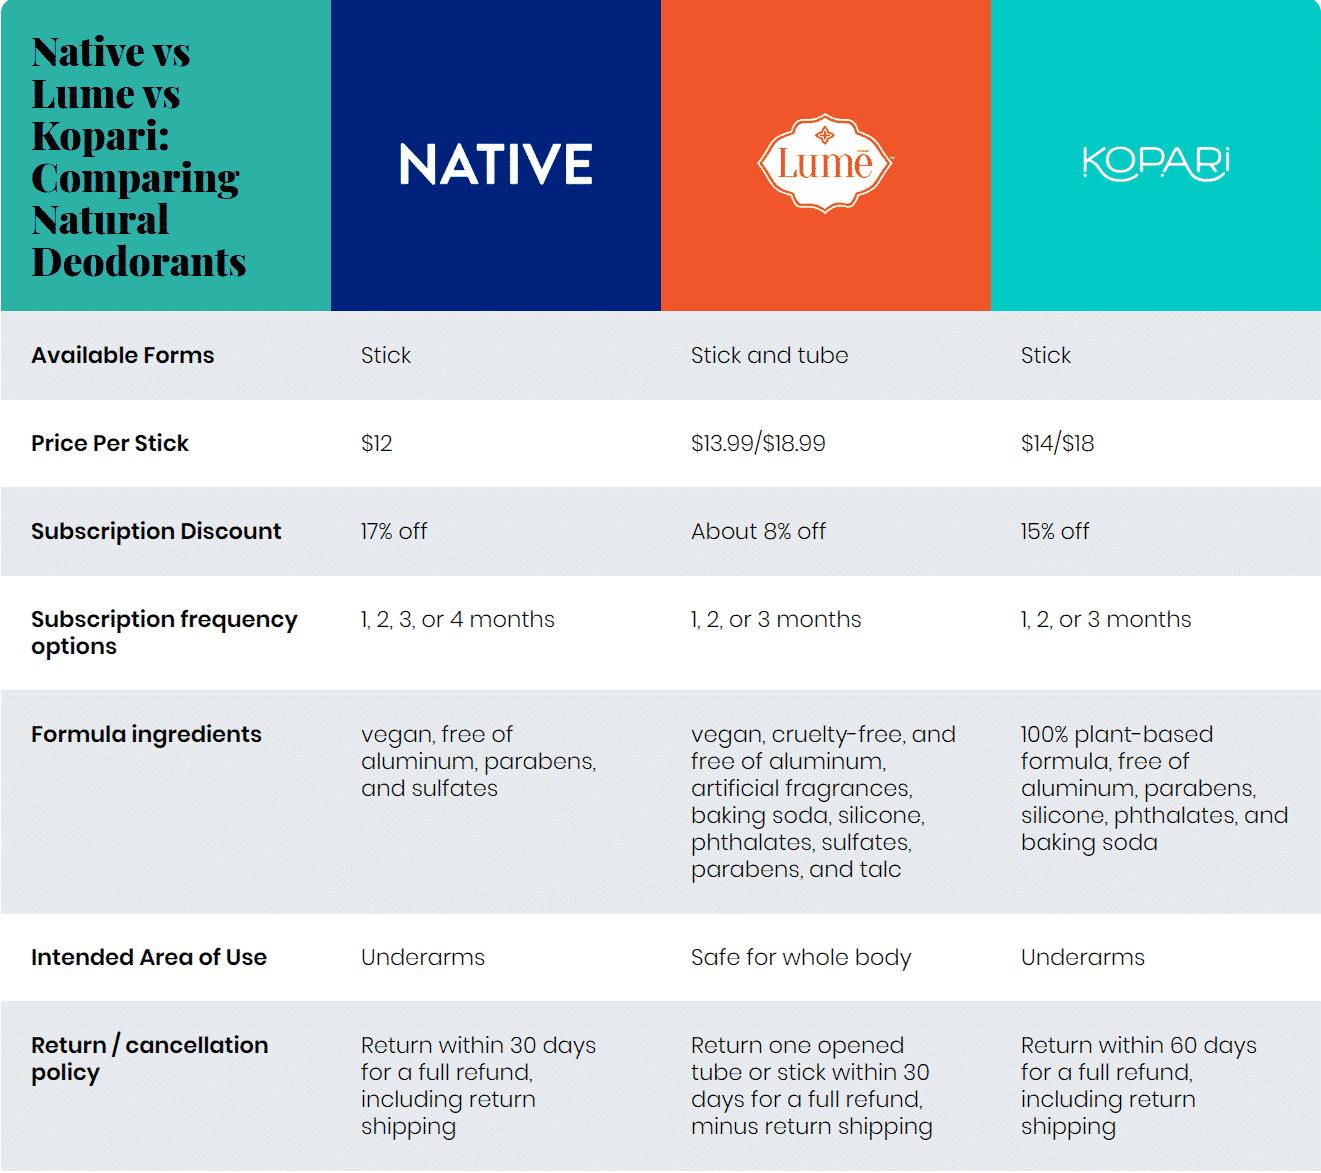 Native vs Lume vs Kopari: Comparing Natural Deodorants